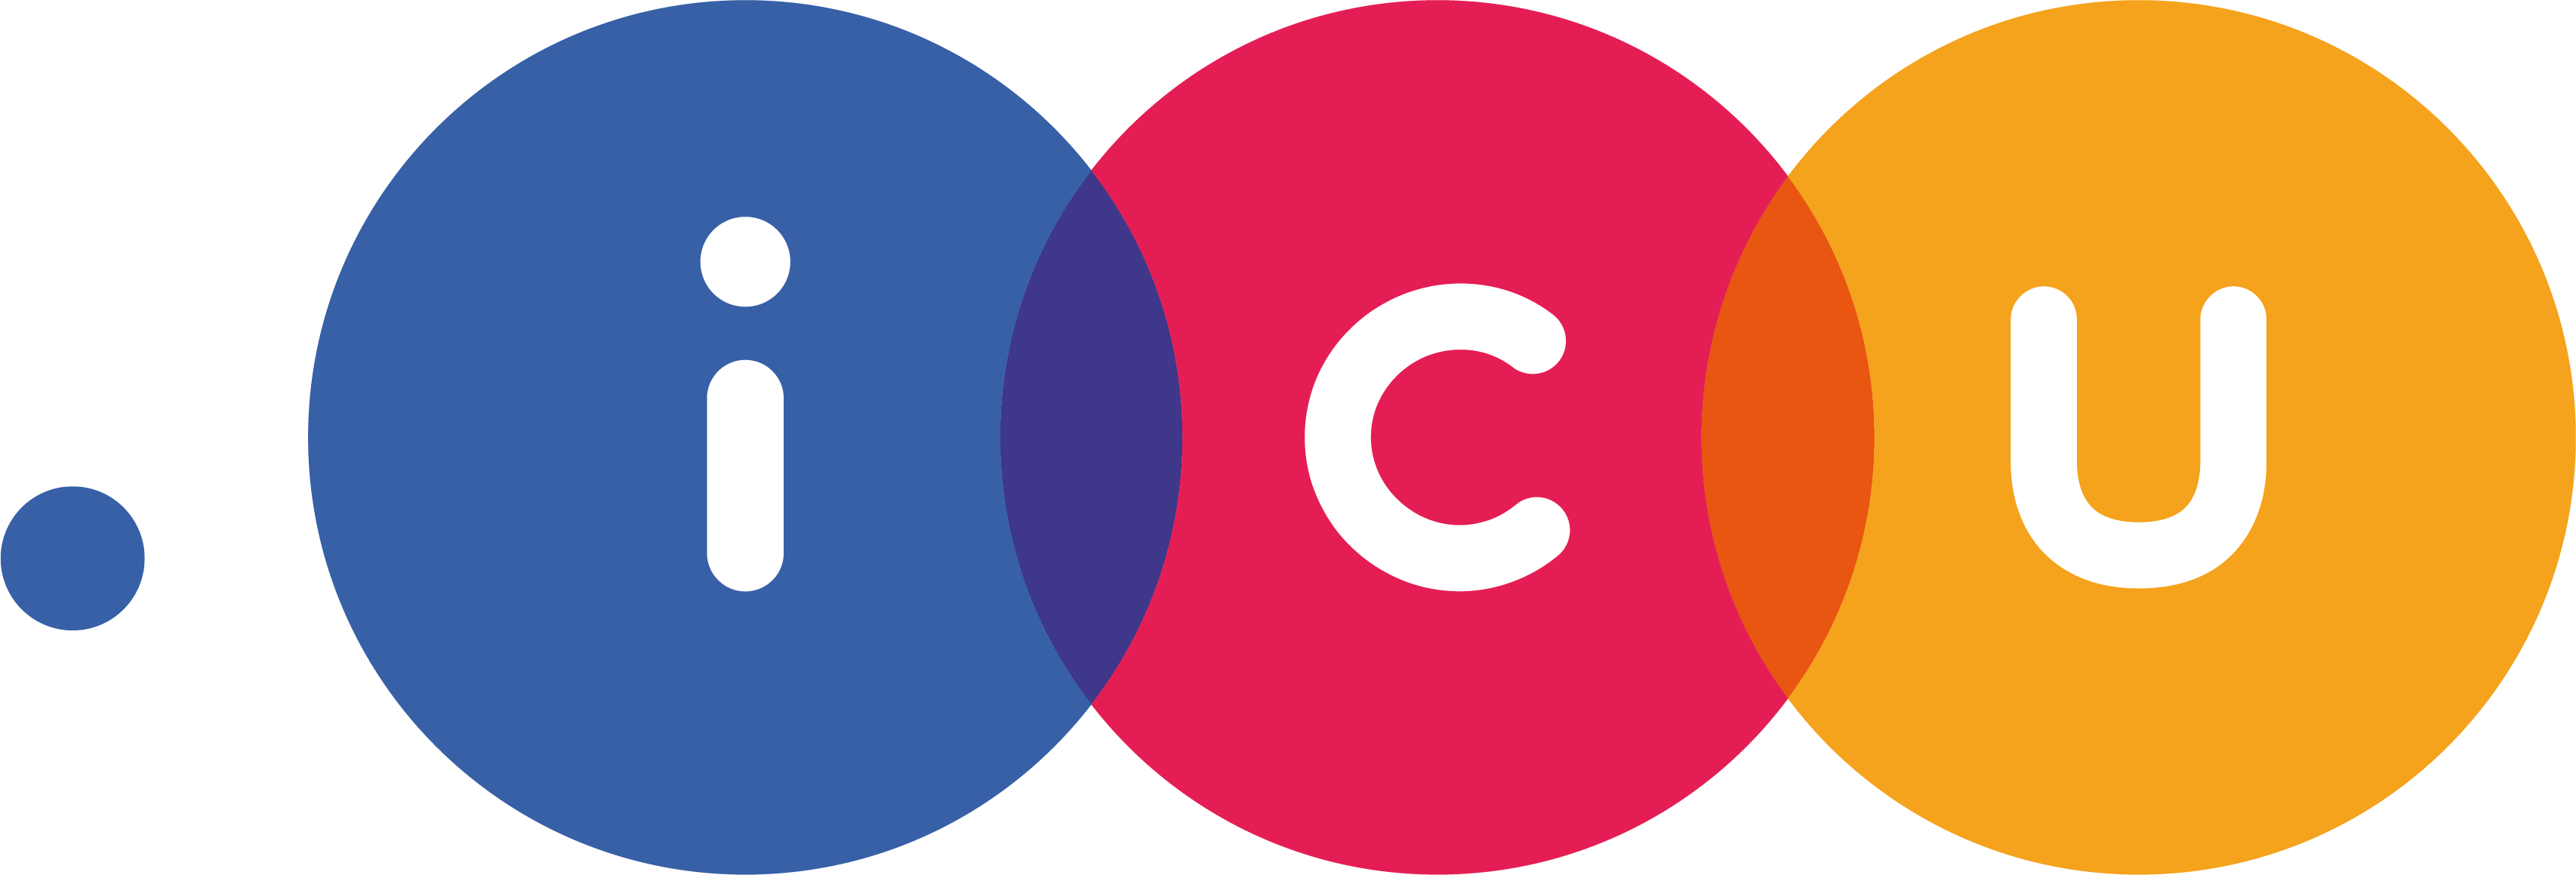 icu-logo_rvb.png